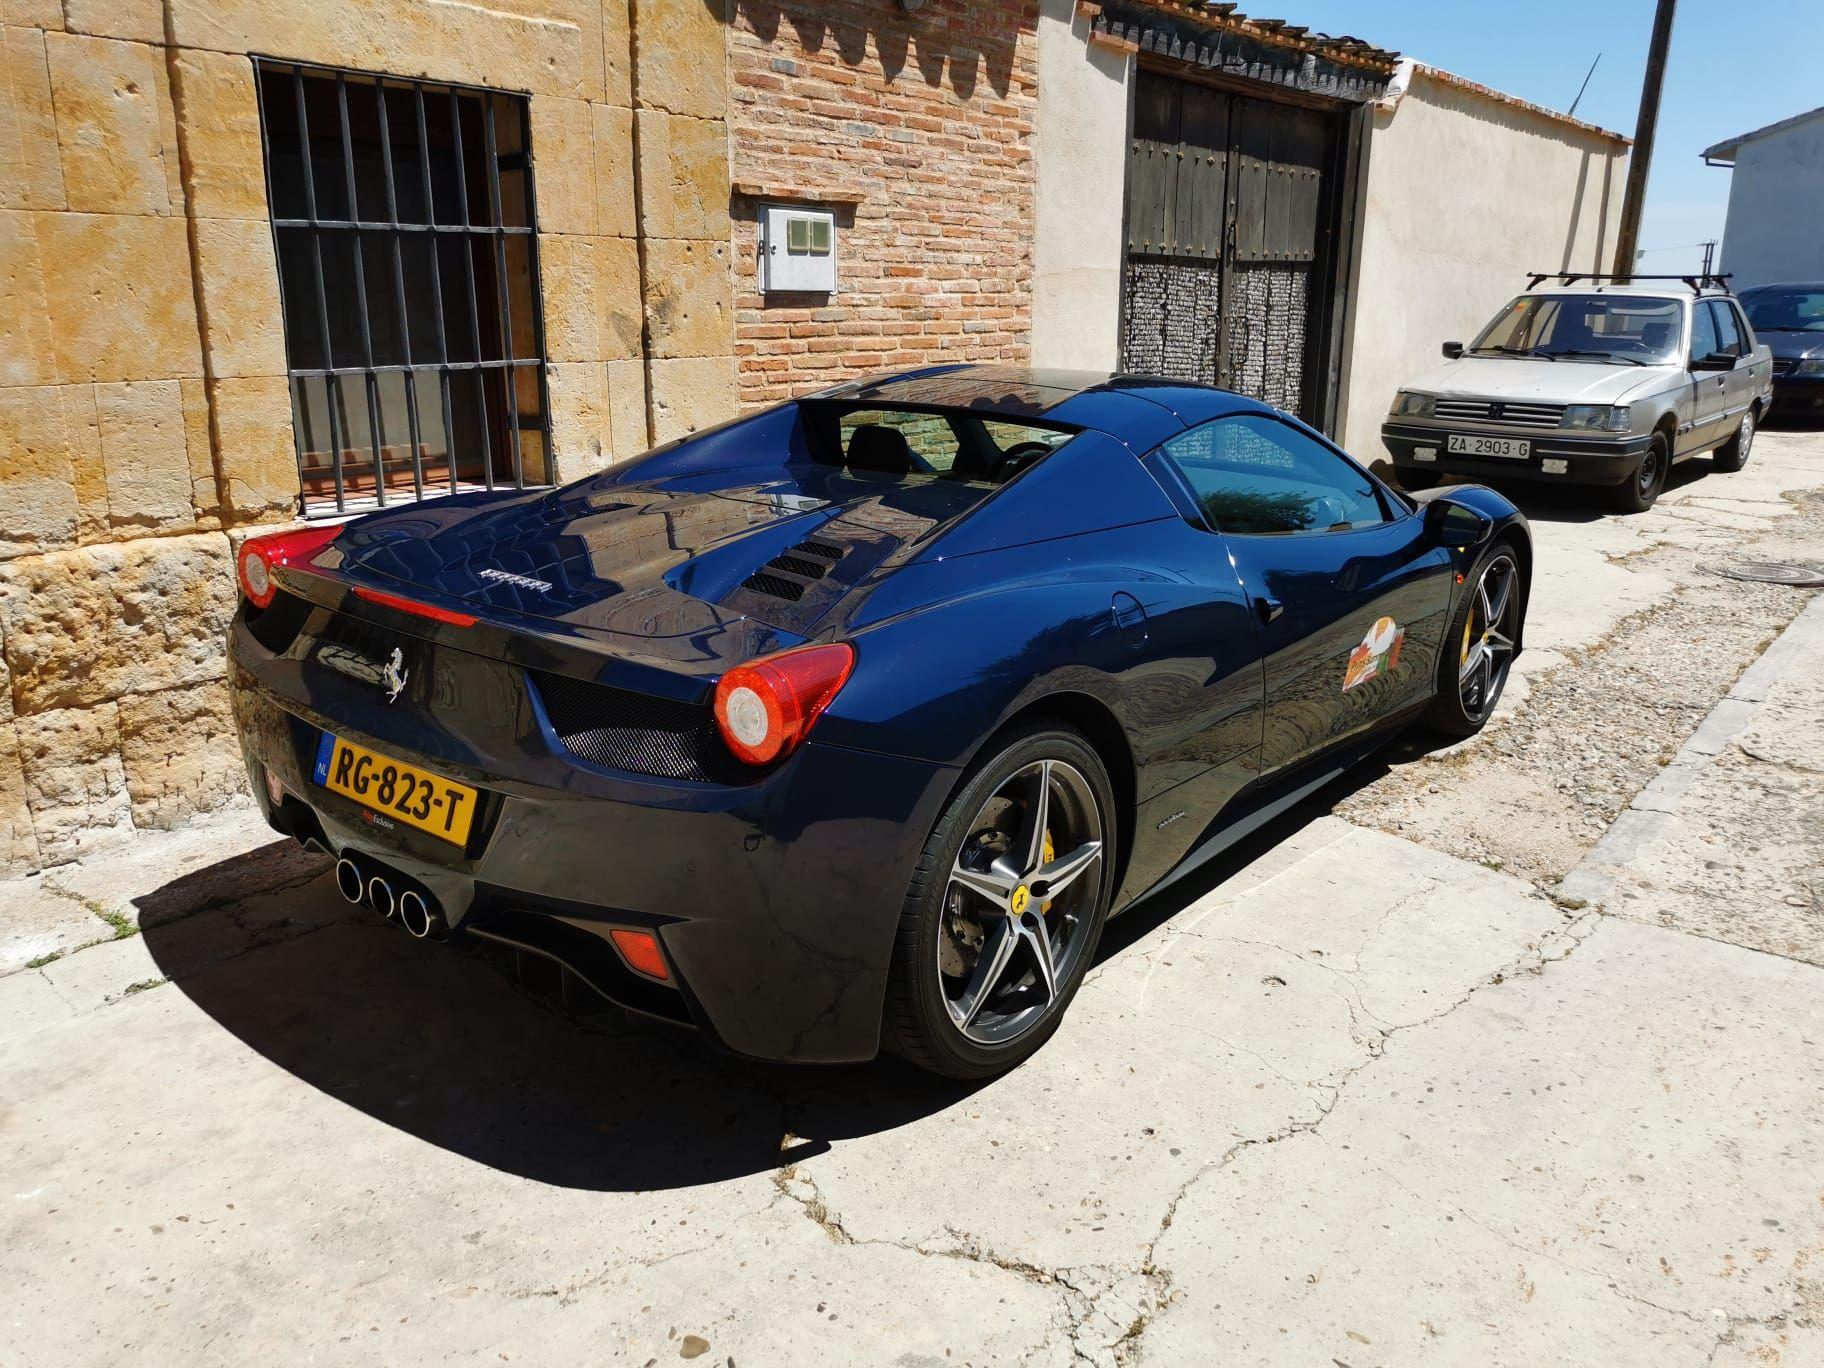 GALERÍA | Porsches, ferraris, lamborghinis de la Prins Summer Tour toman El Perdigón (Zamora)